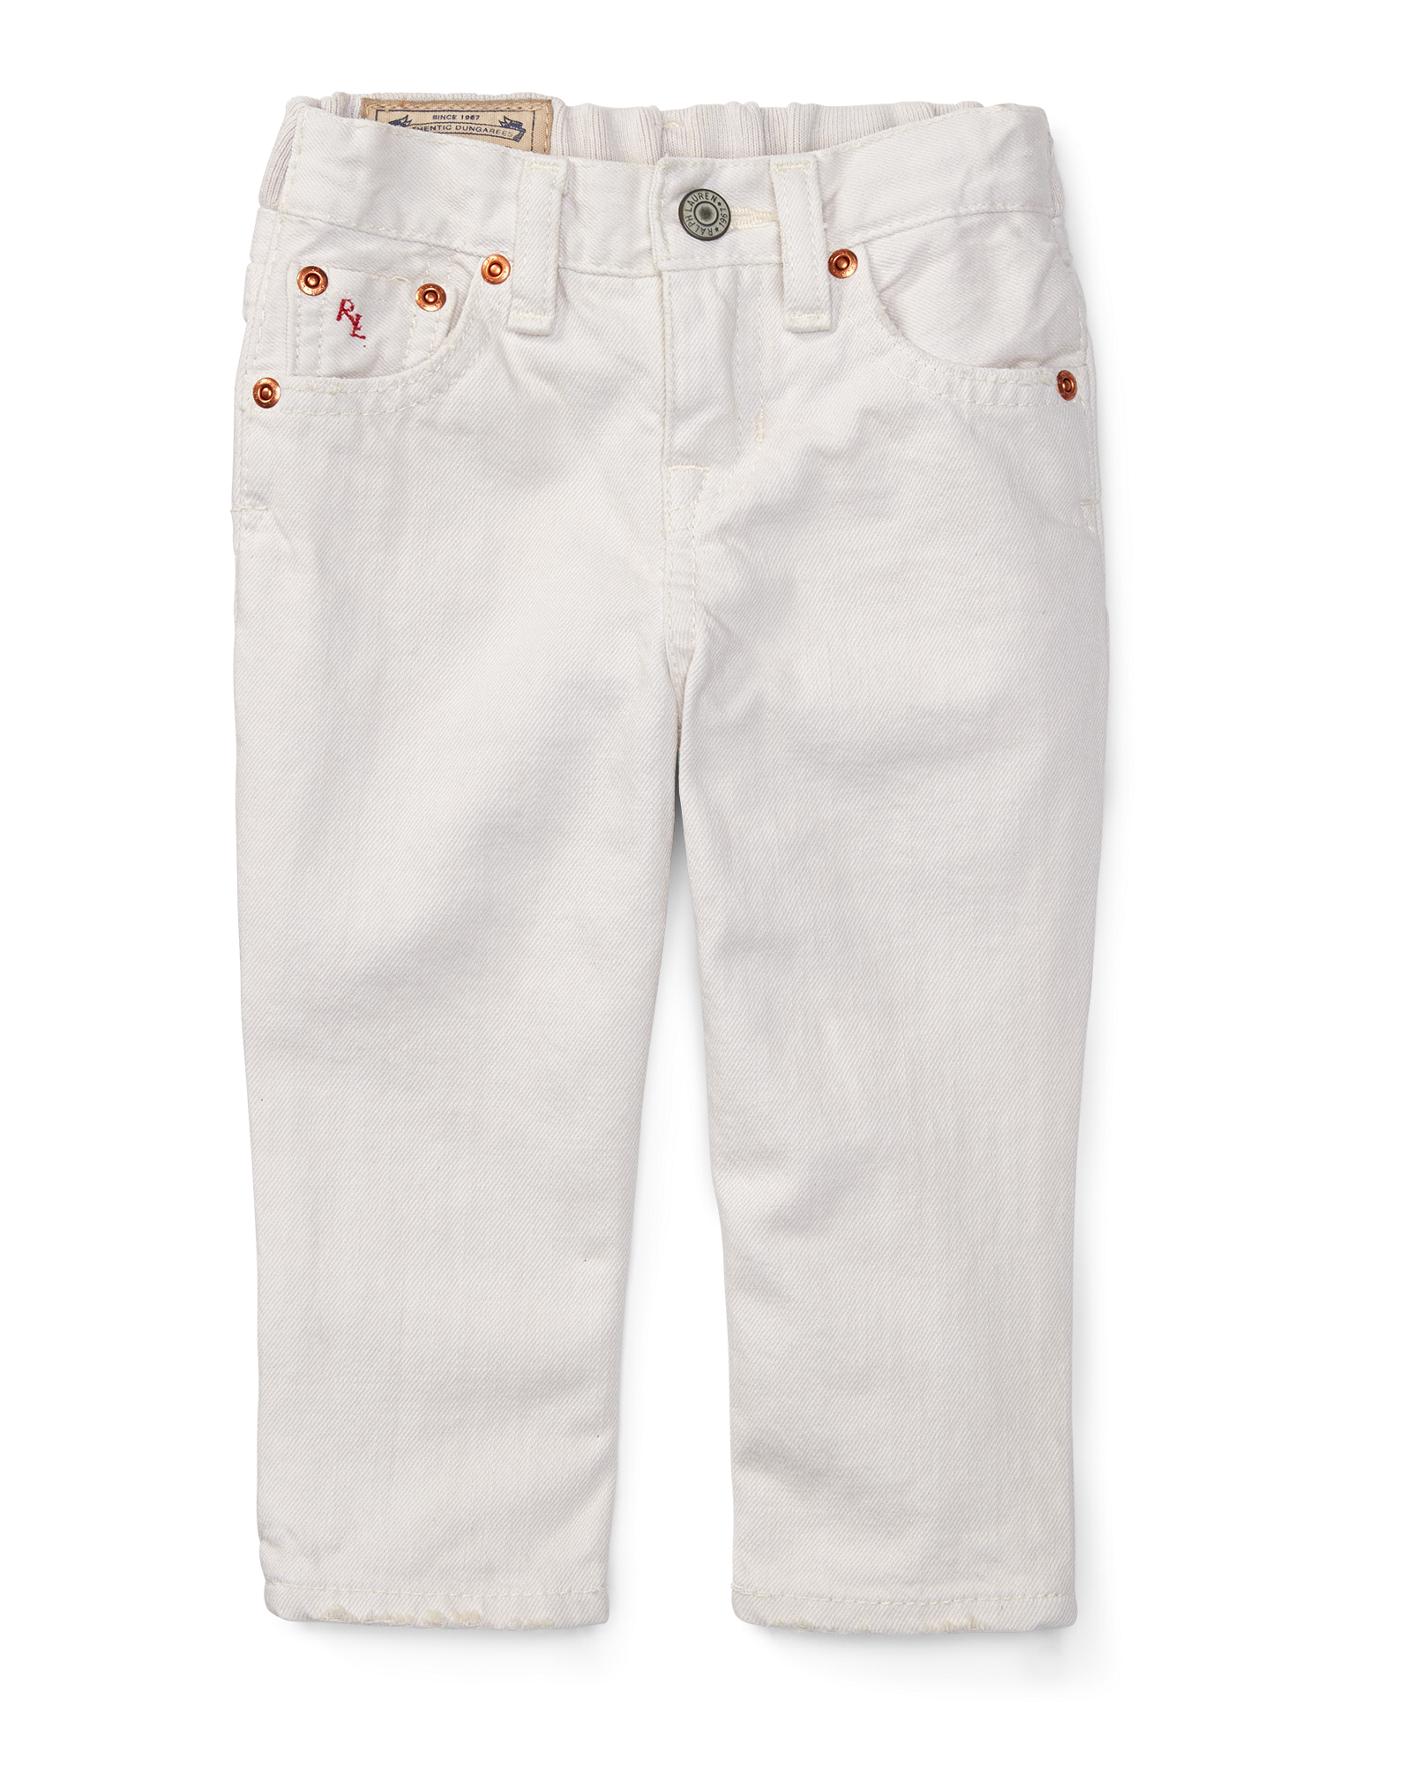 Baby Boys' Pants, Jeans, Leggings, & Shorts | Ralph Lauren